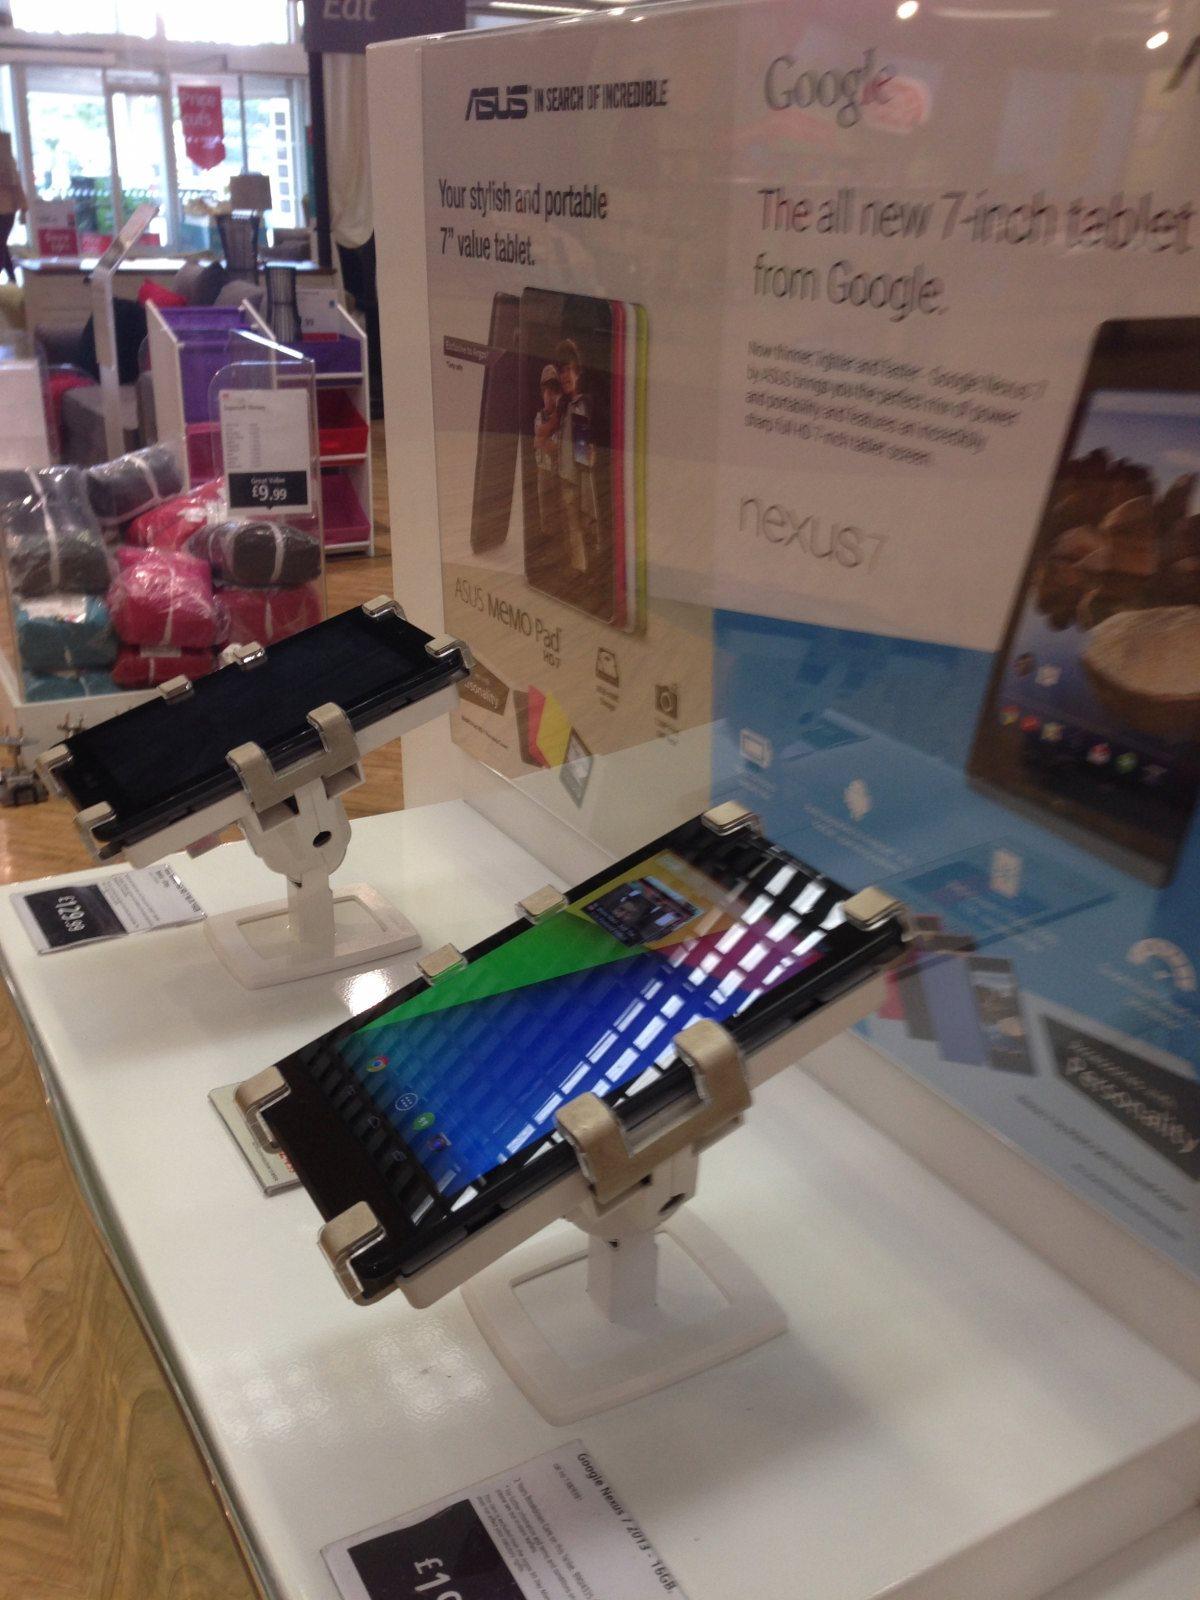 gripzo-2-ipad-tablets.jpg